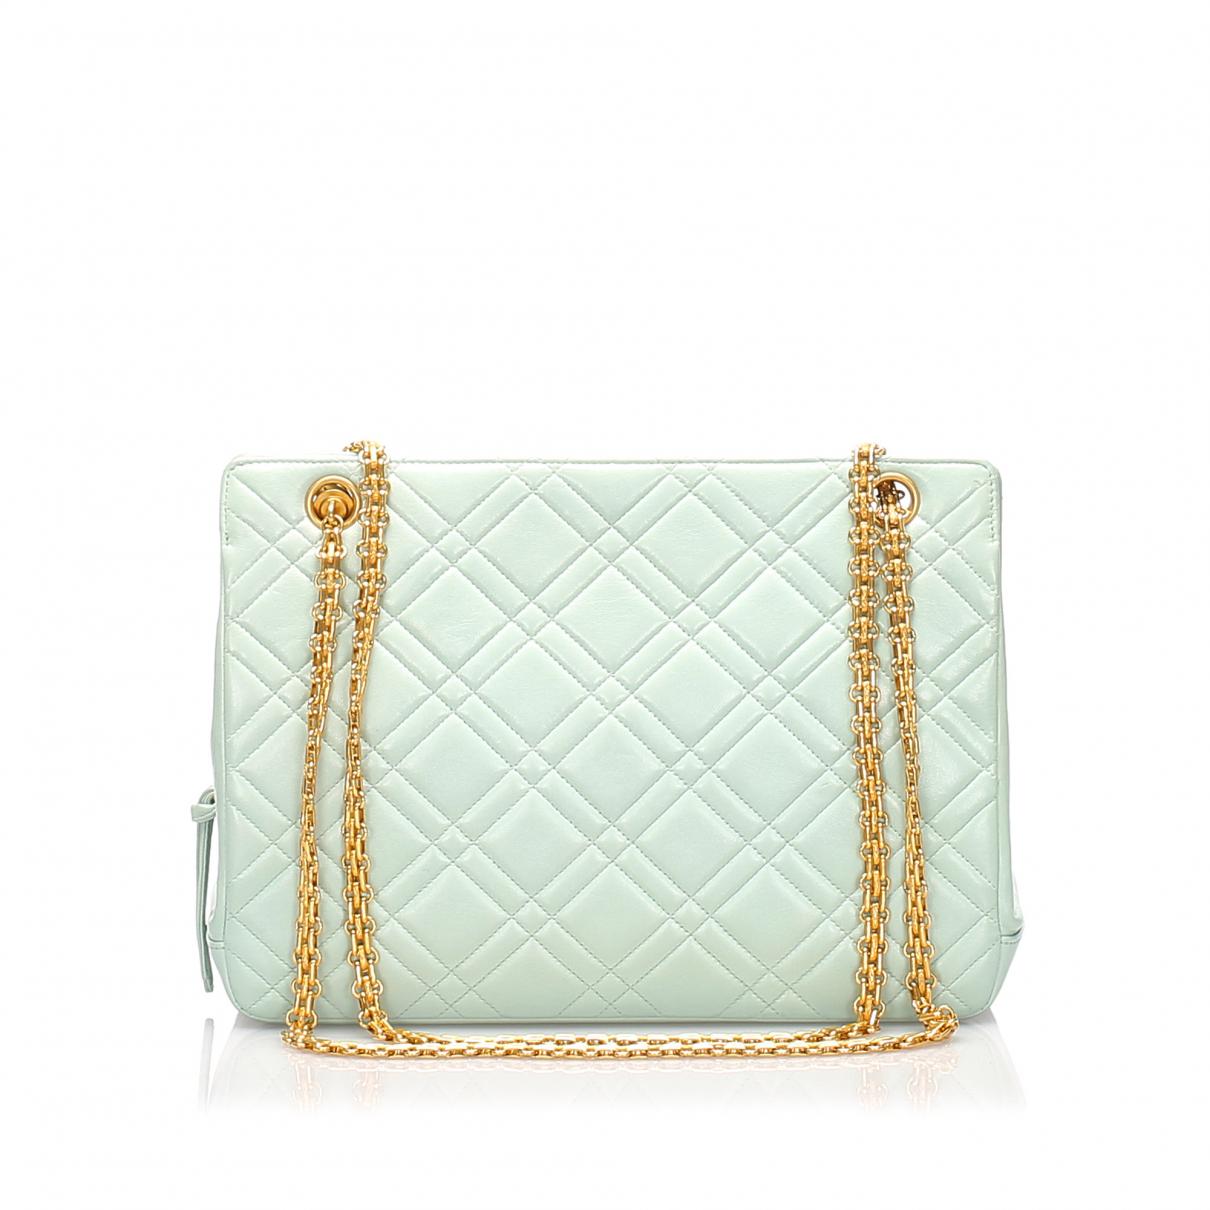 Chanel - Sac a main   pour femme en cuir - vert